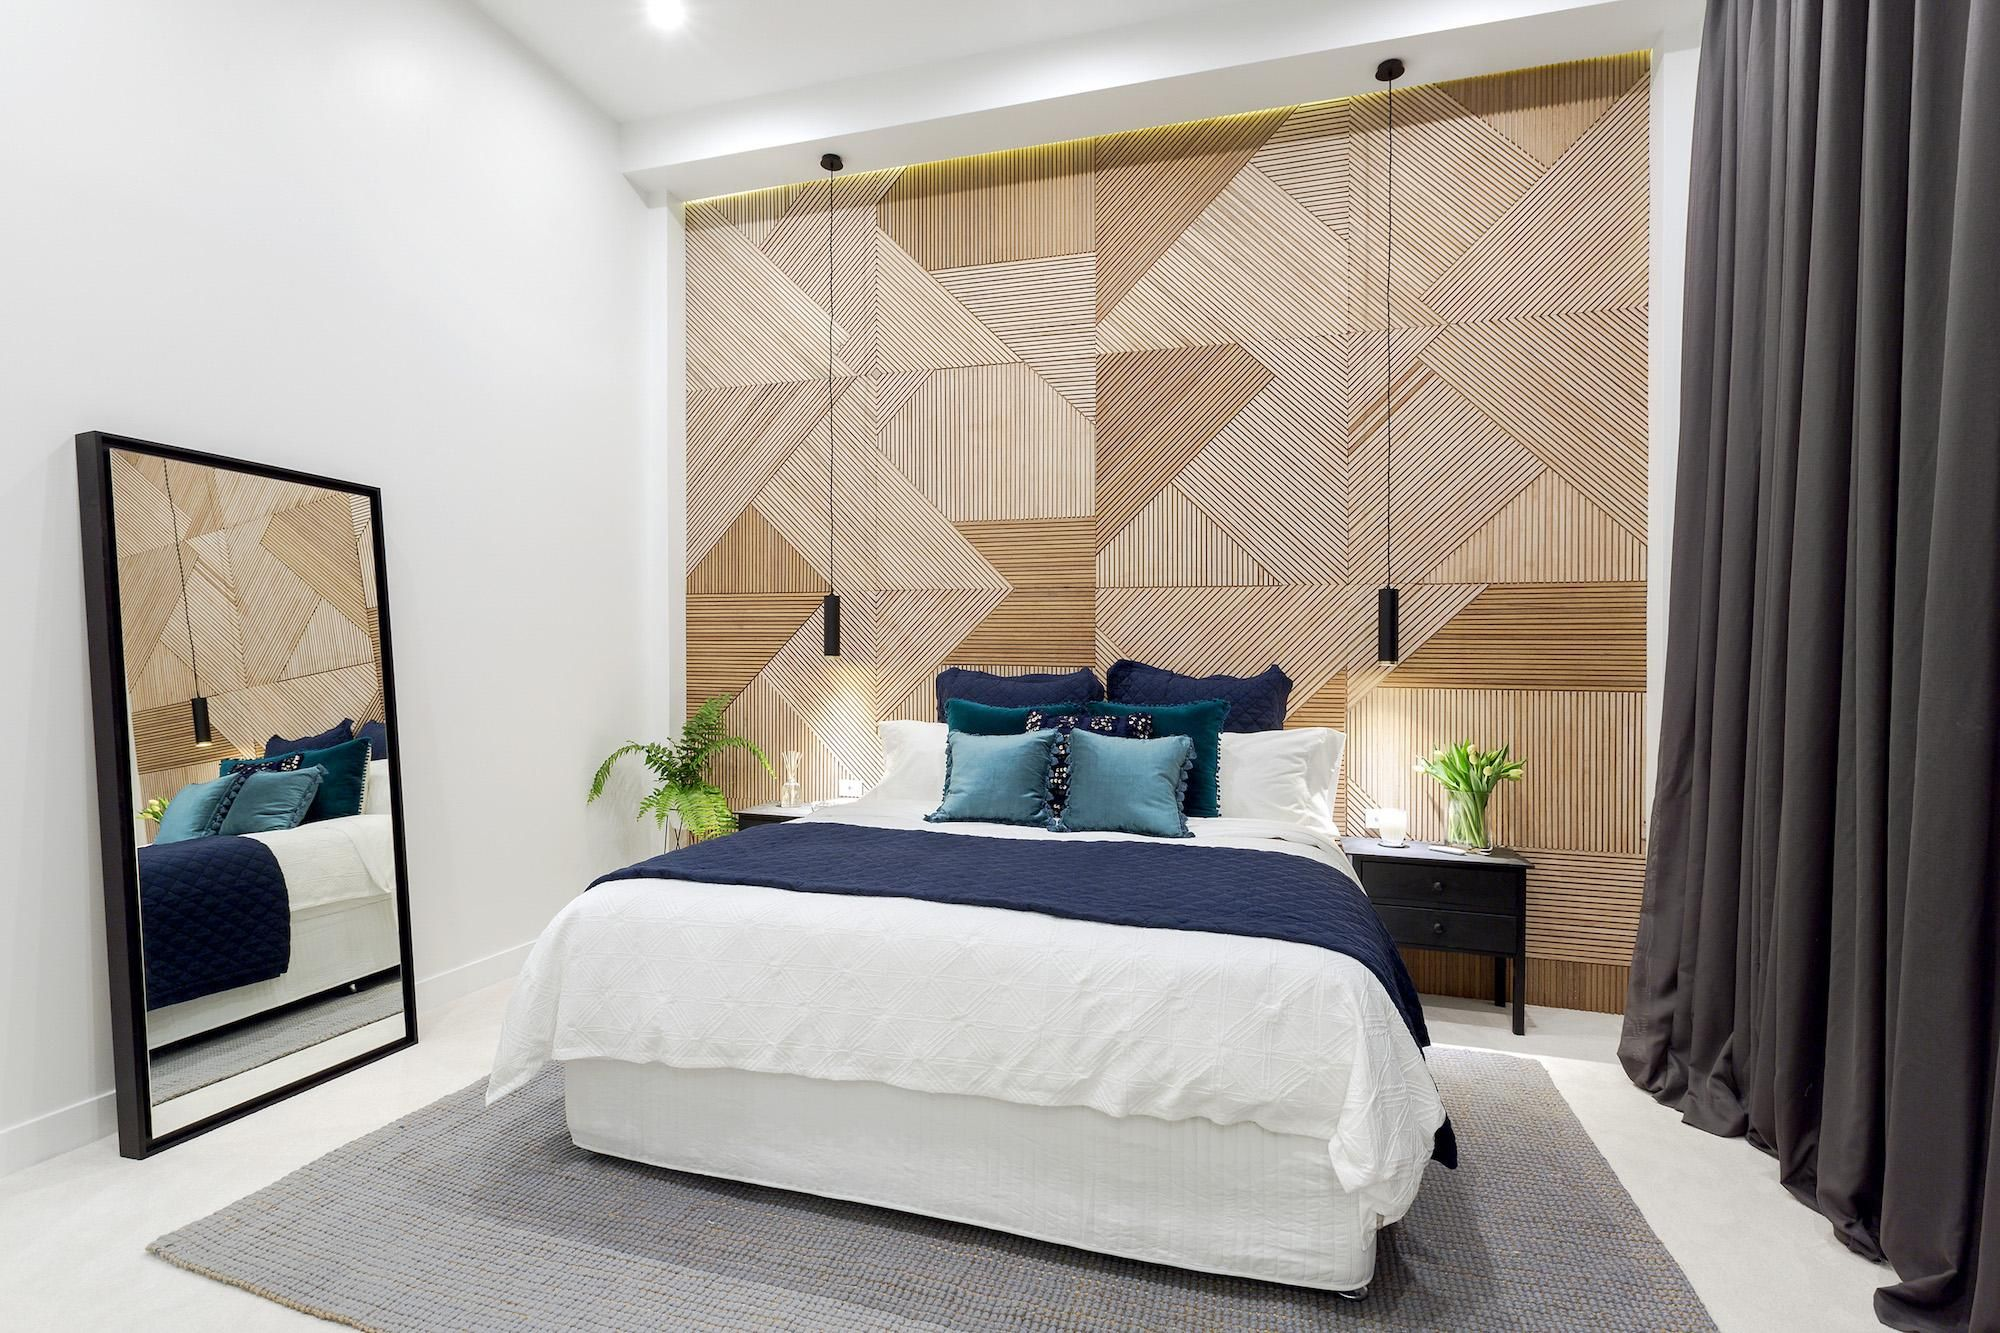 Master Bedroom Feature Wall Will Karlie Week 6 Master Bedroom The Block 2016 Pinterest